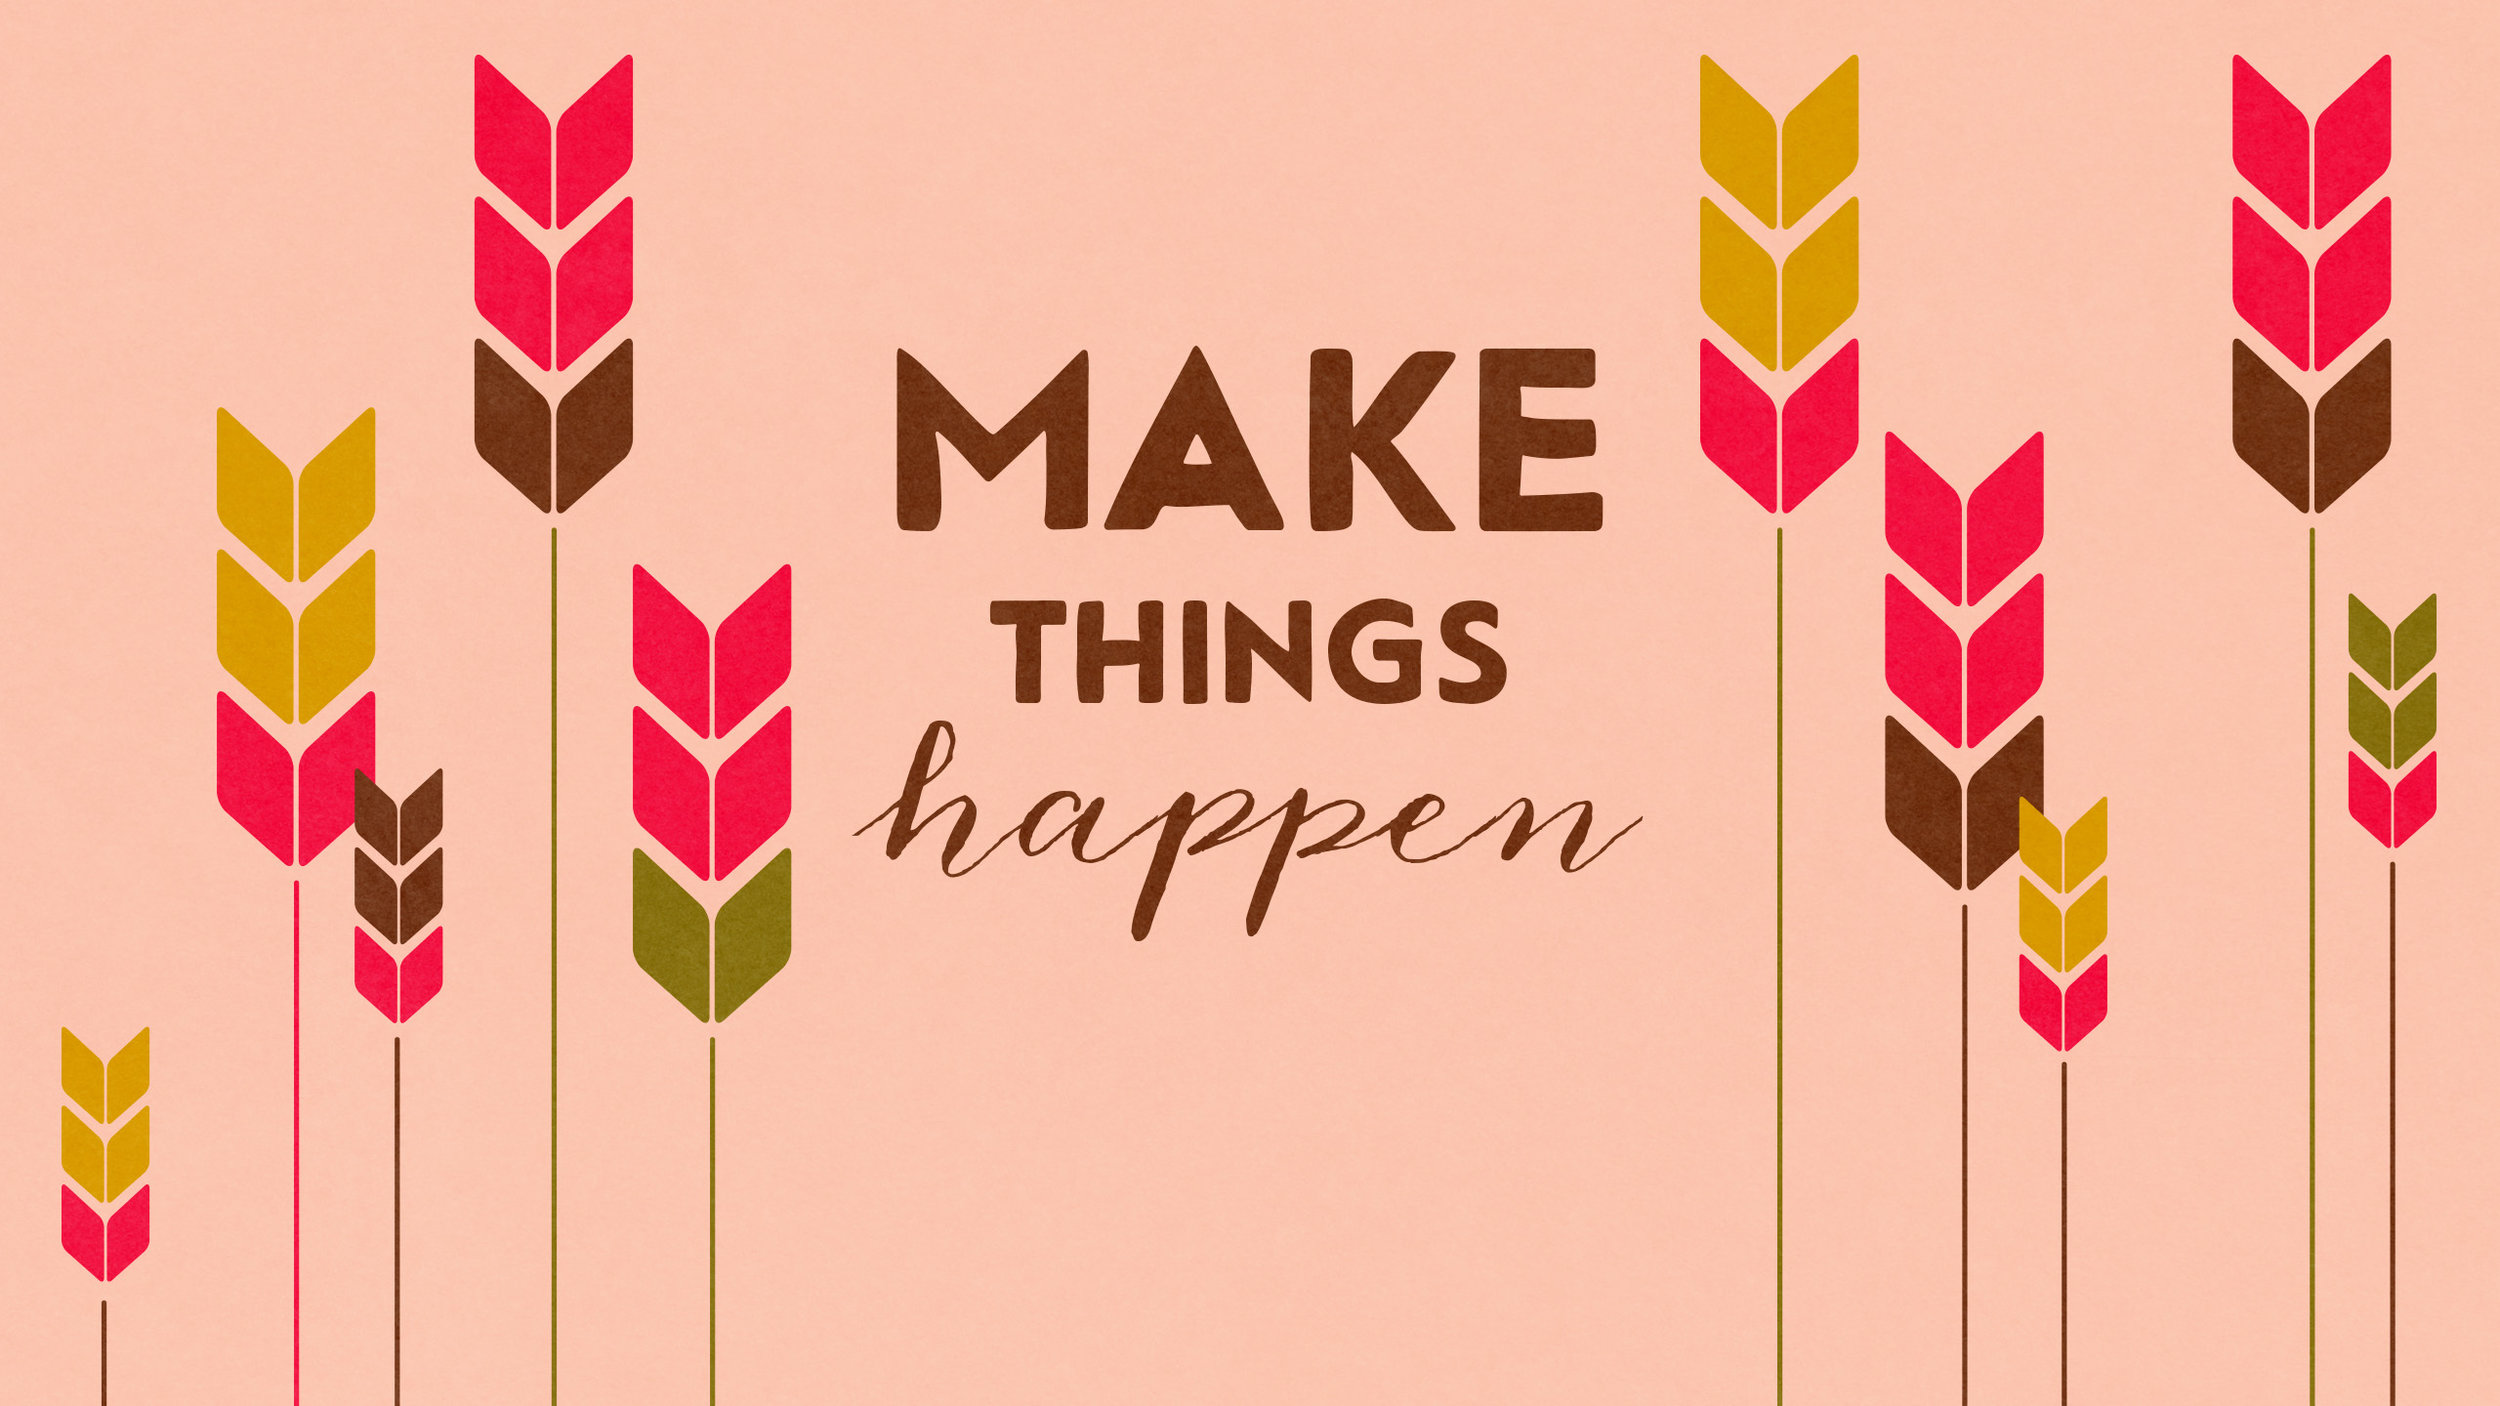 sept-2560x1440-make-it-happen